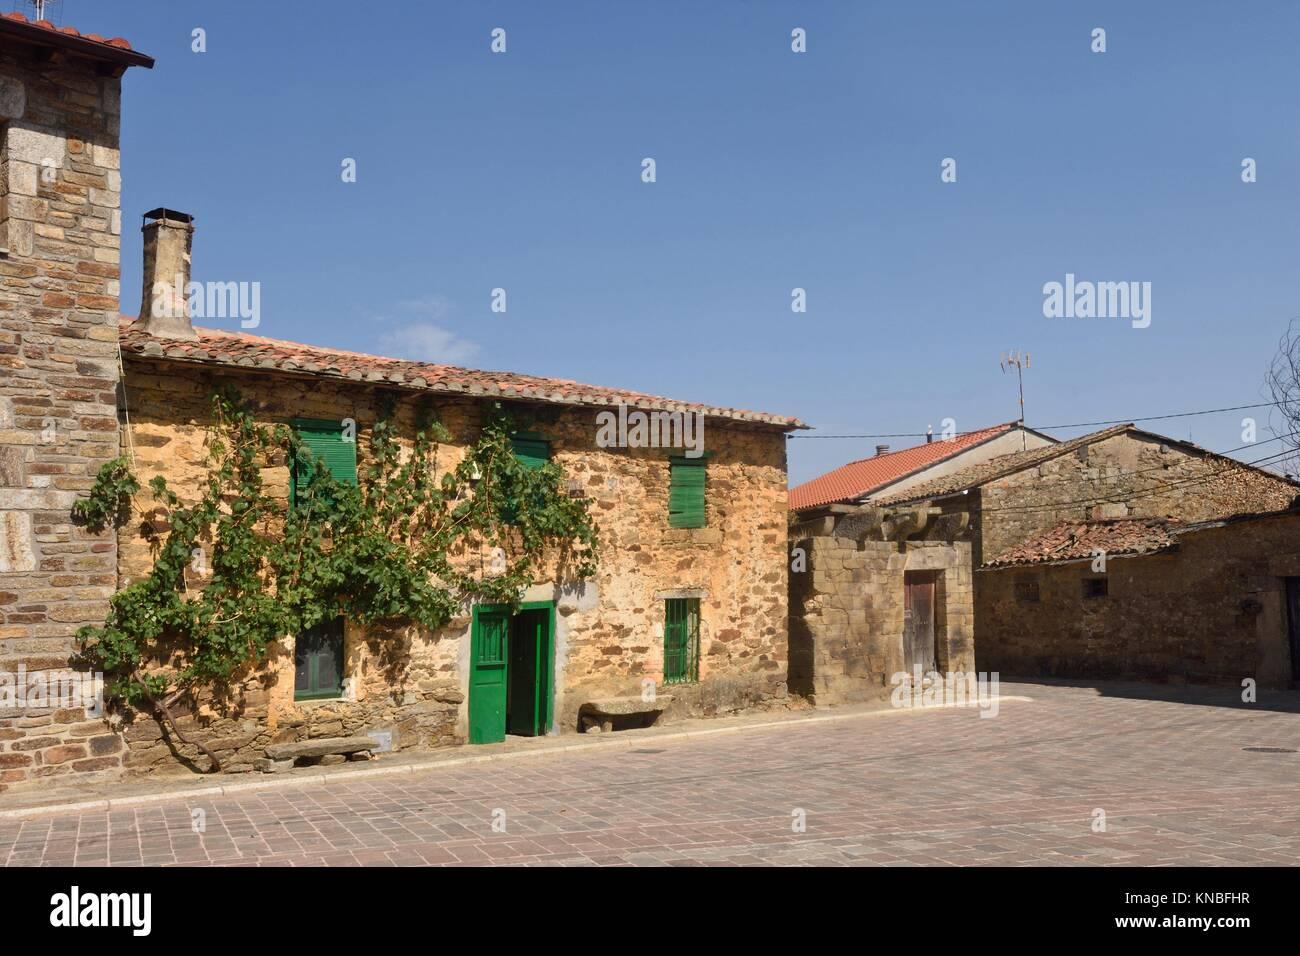 Village of villardeciervos, Sierra de La Culebra, Zamora province,Spain. Stock Photo